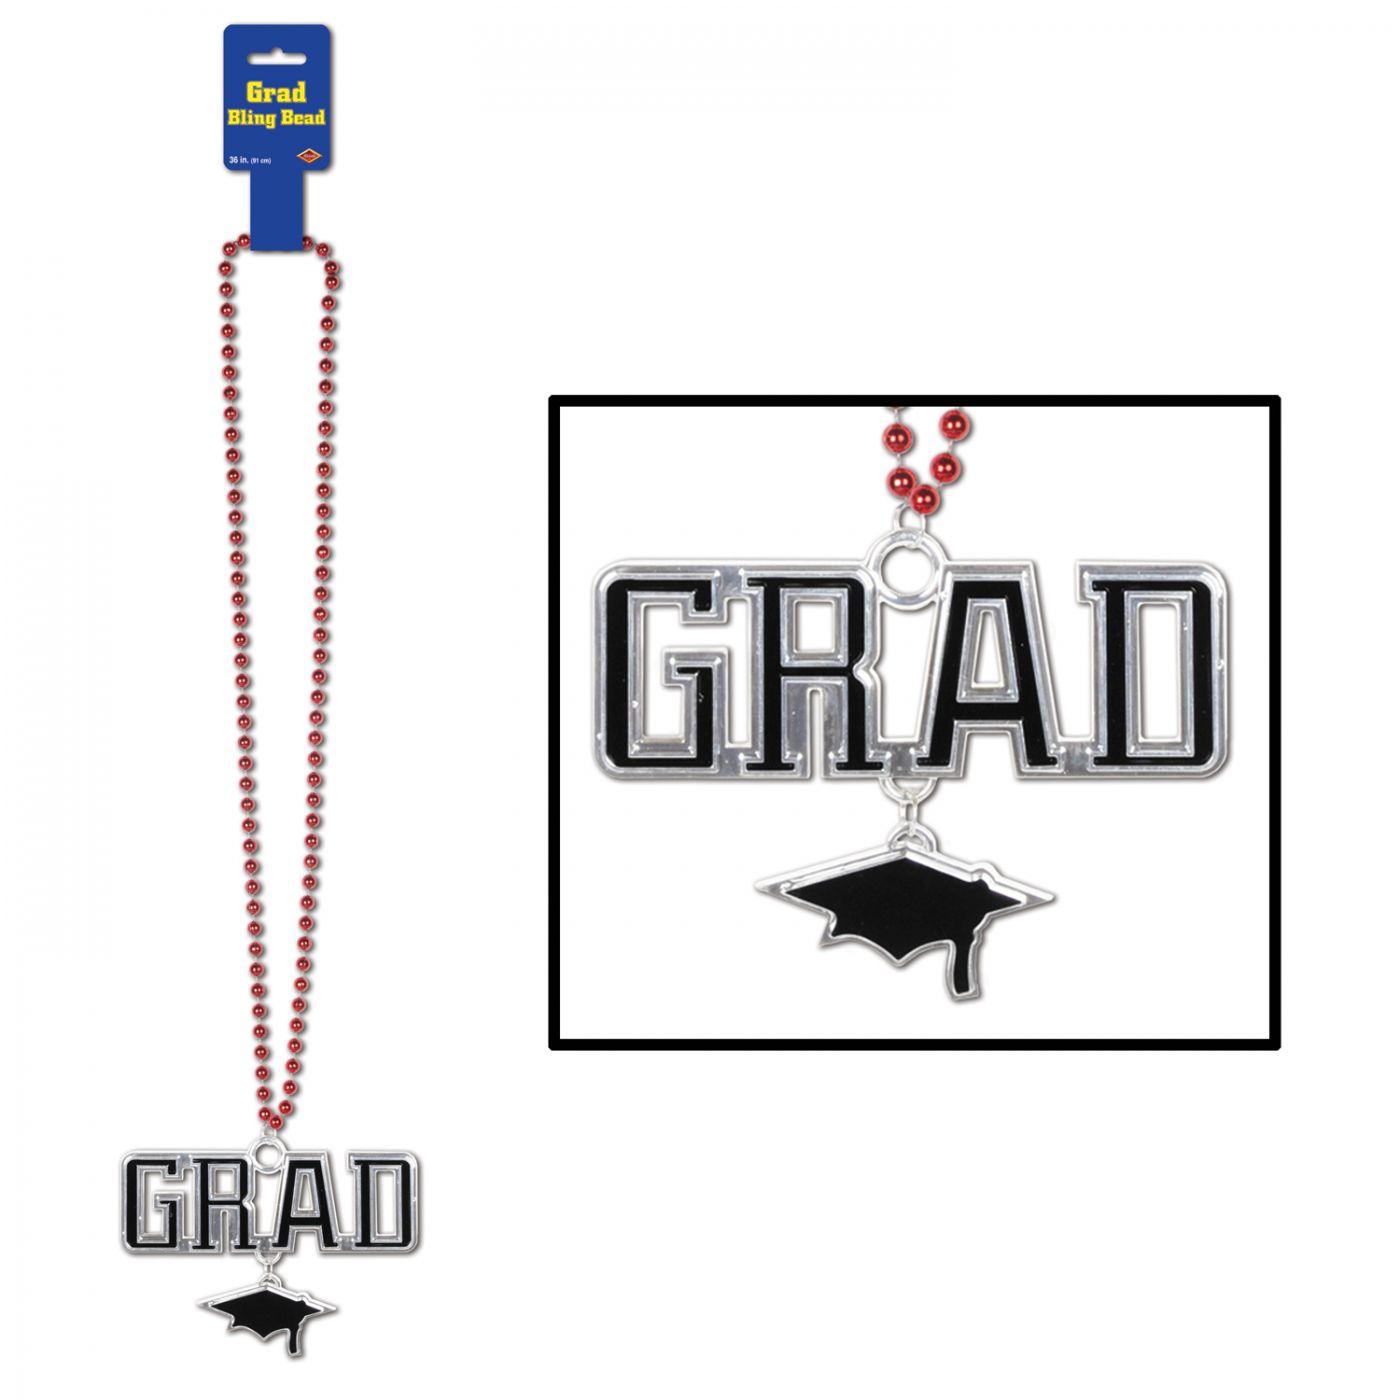 Image of Beads w/Grad Medallion